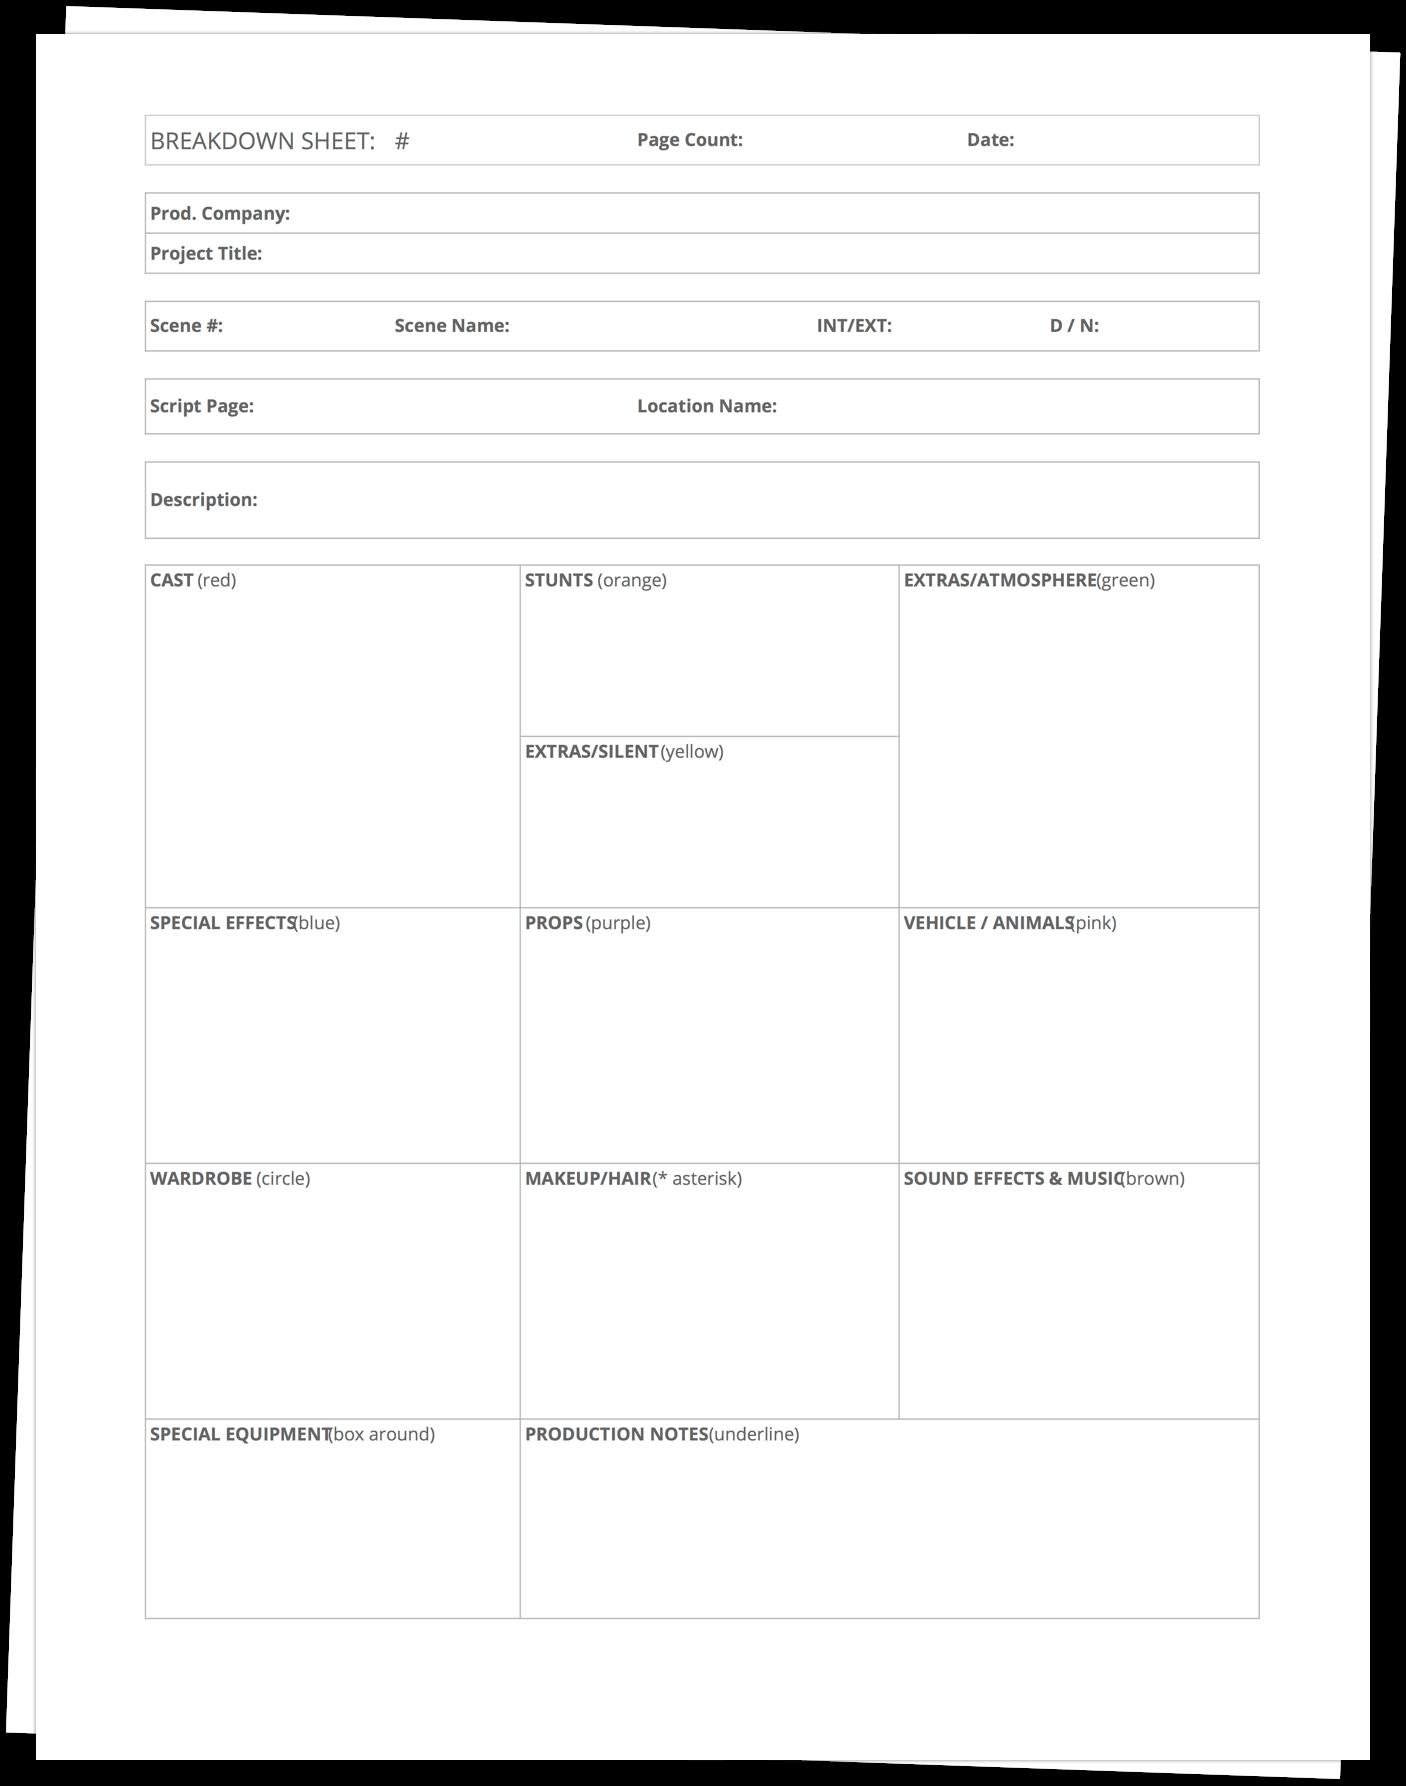 Script Breakdown Sheet Template - Stack - StudioBinder